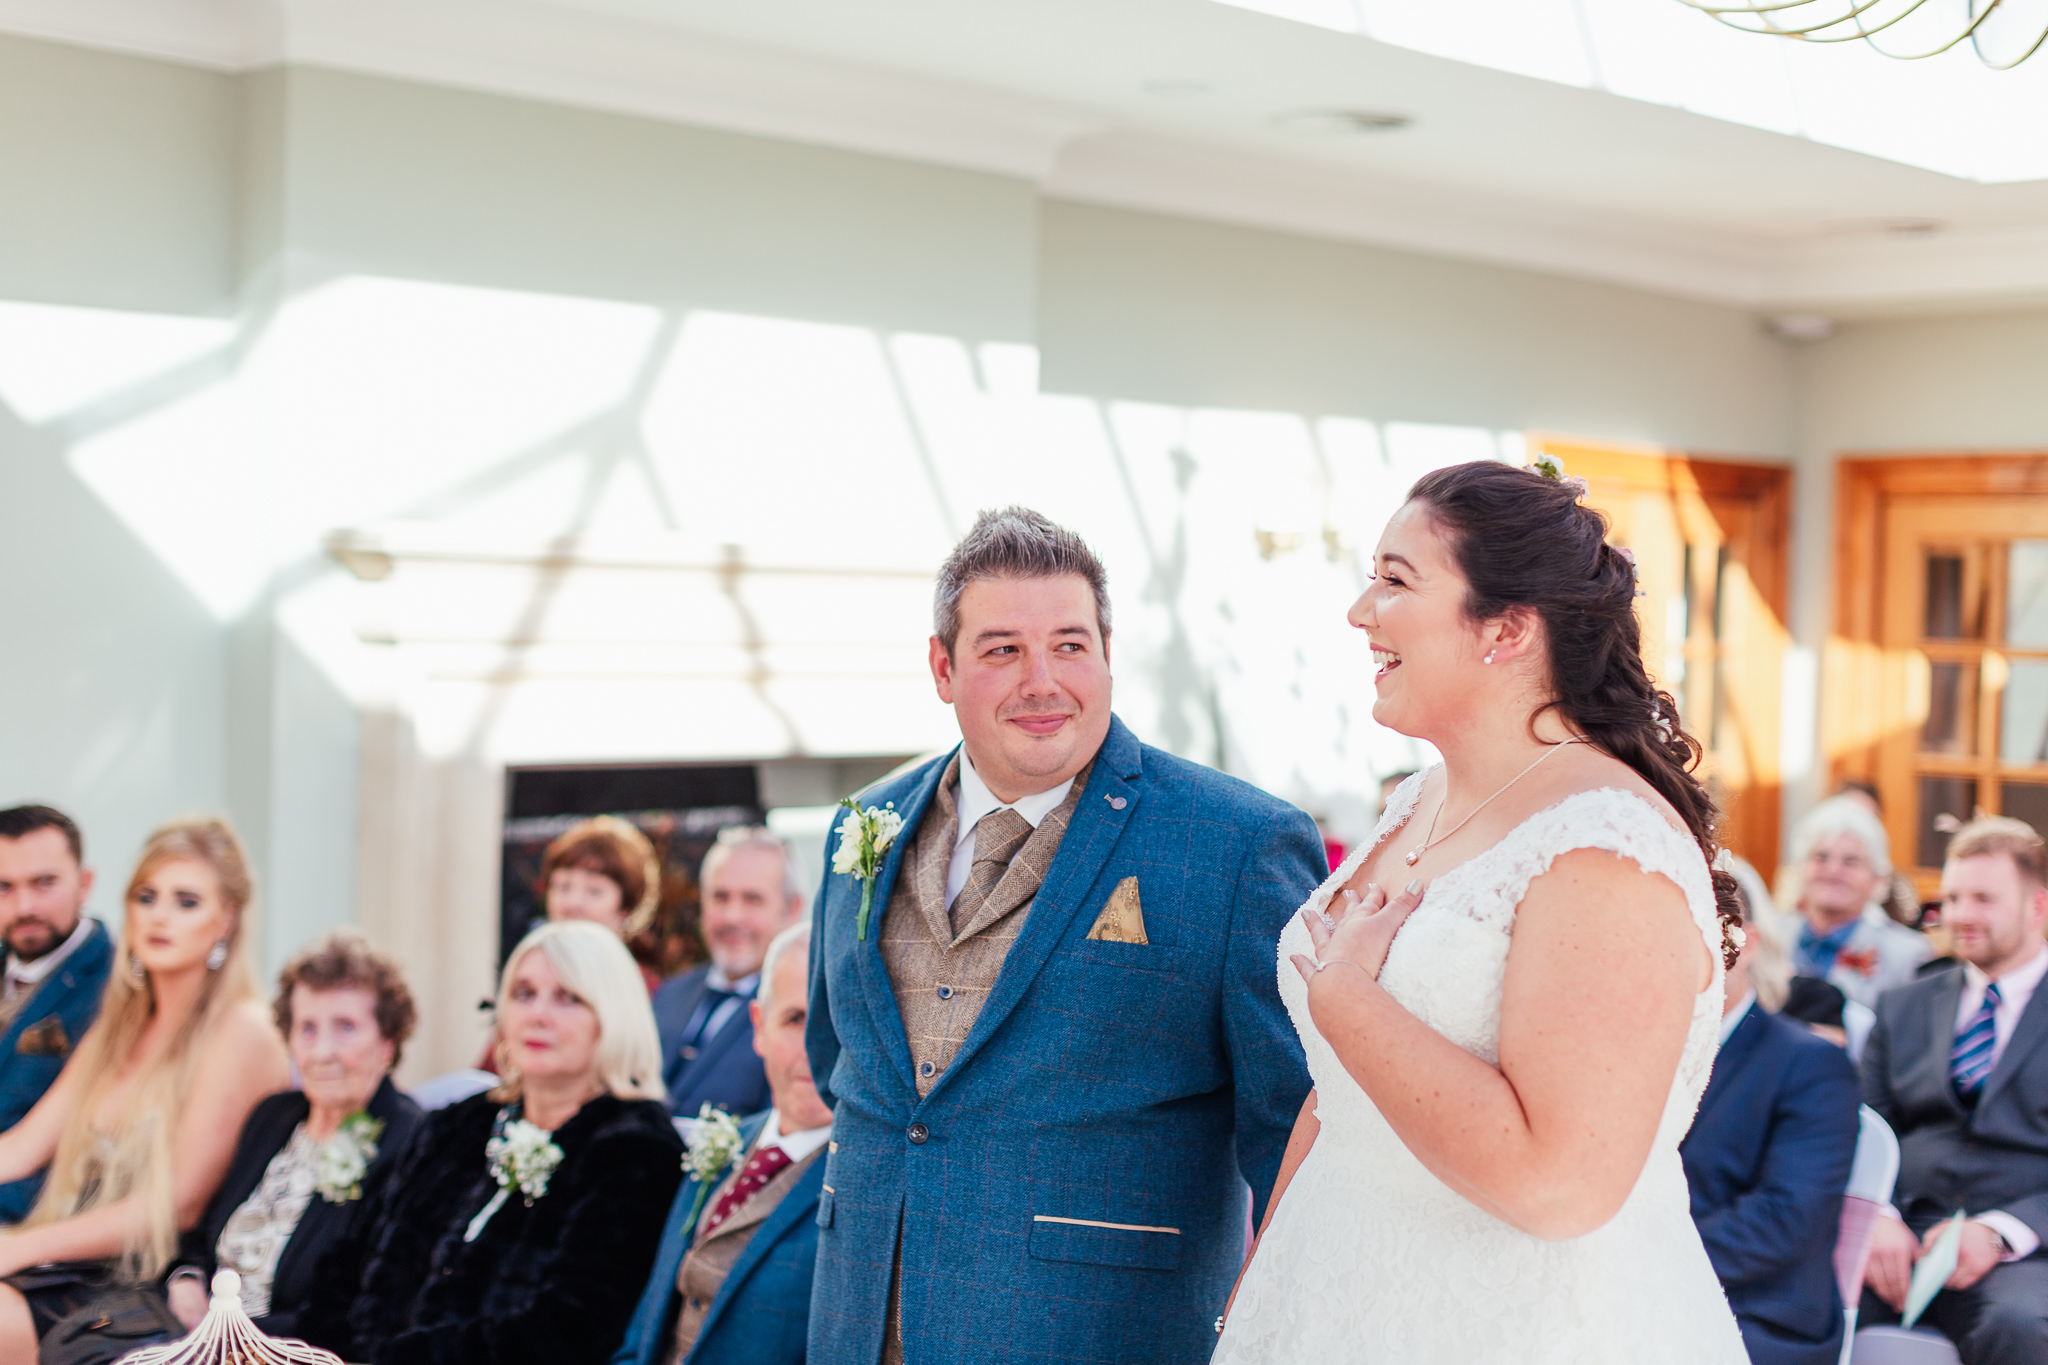 Willington-Hall-Cheshire-Wedding-16.jpg